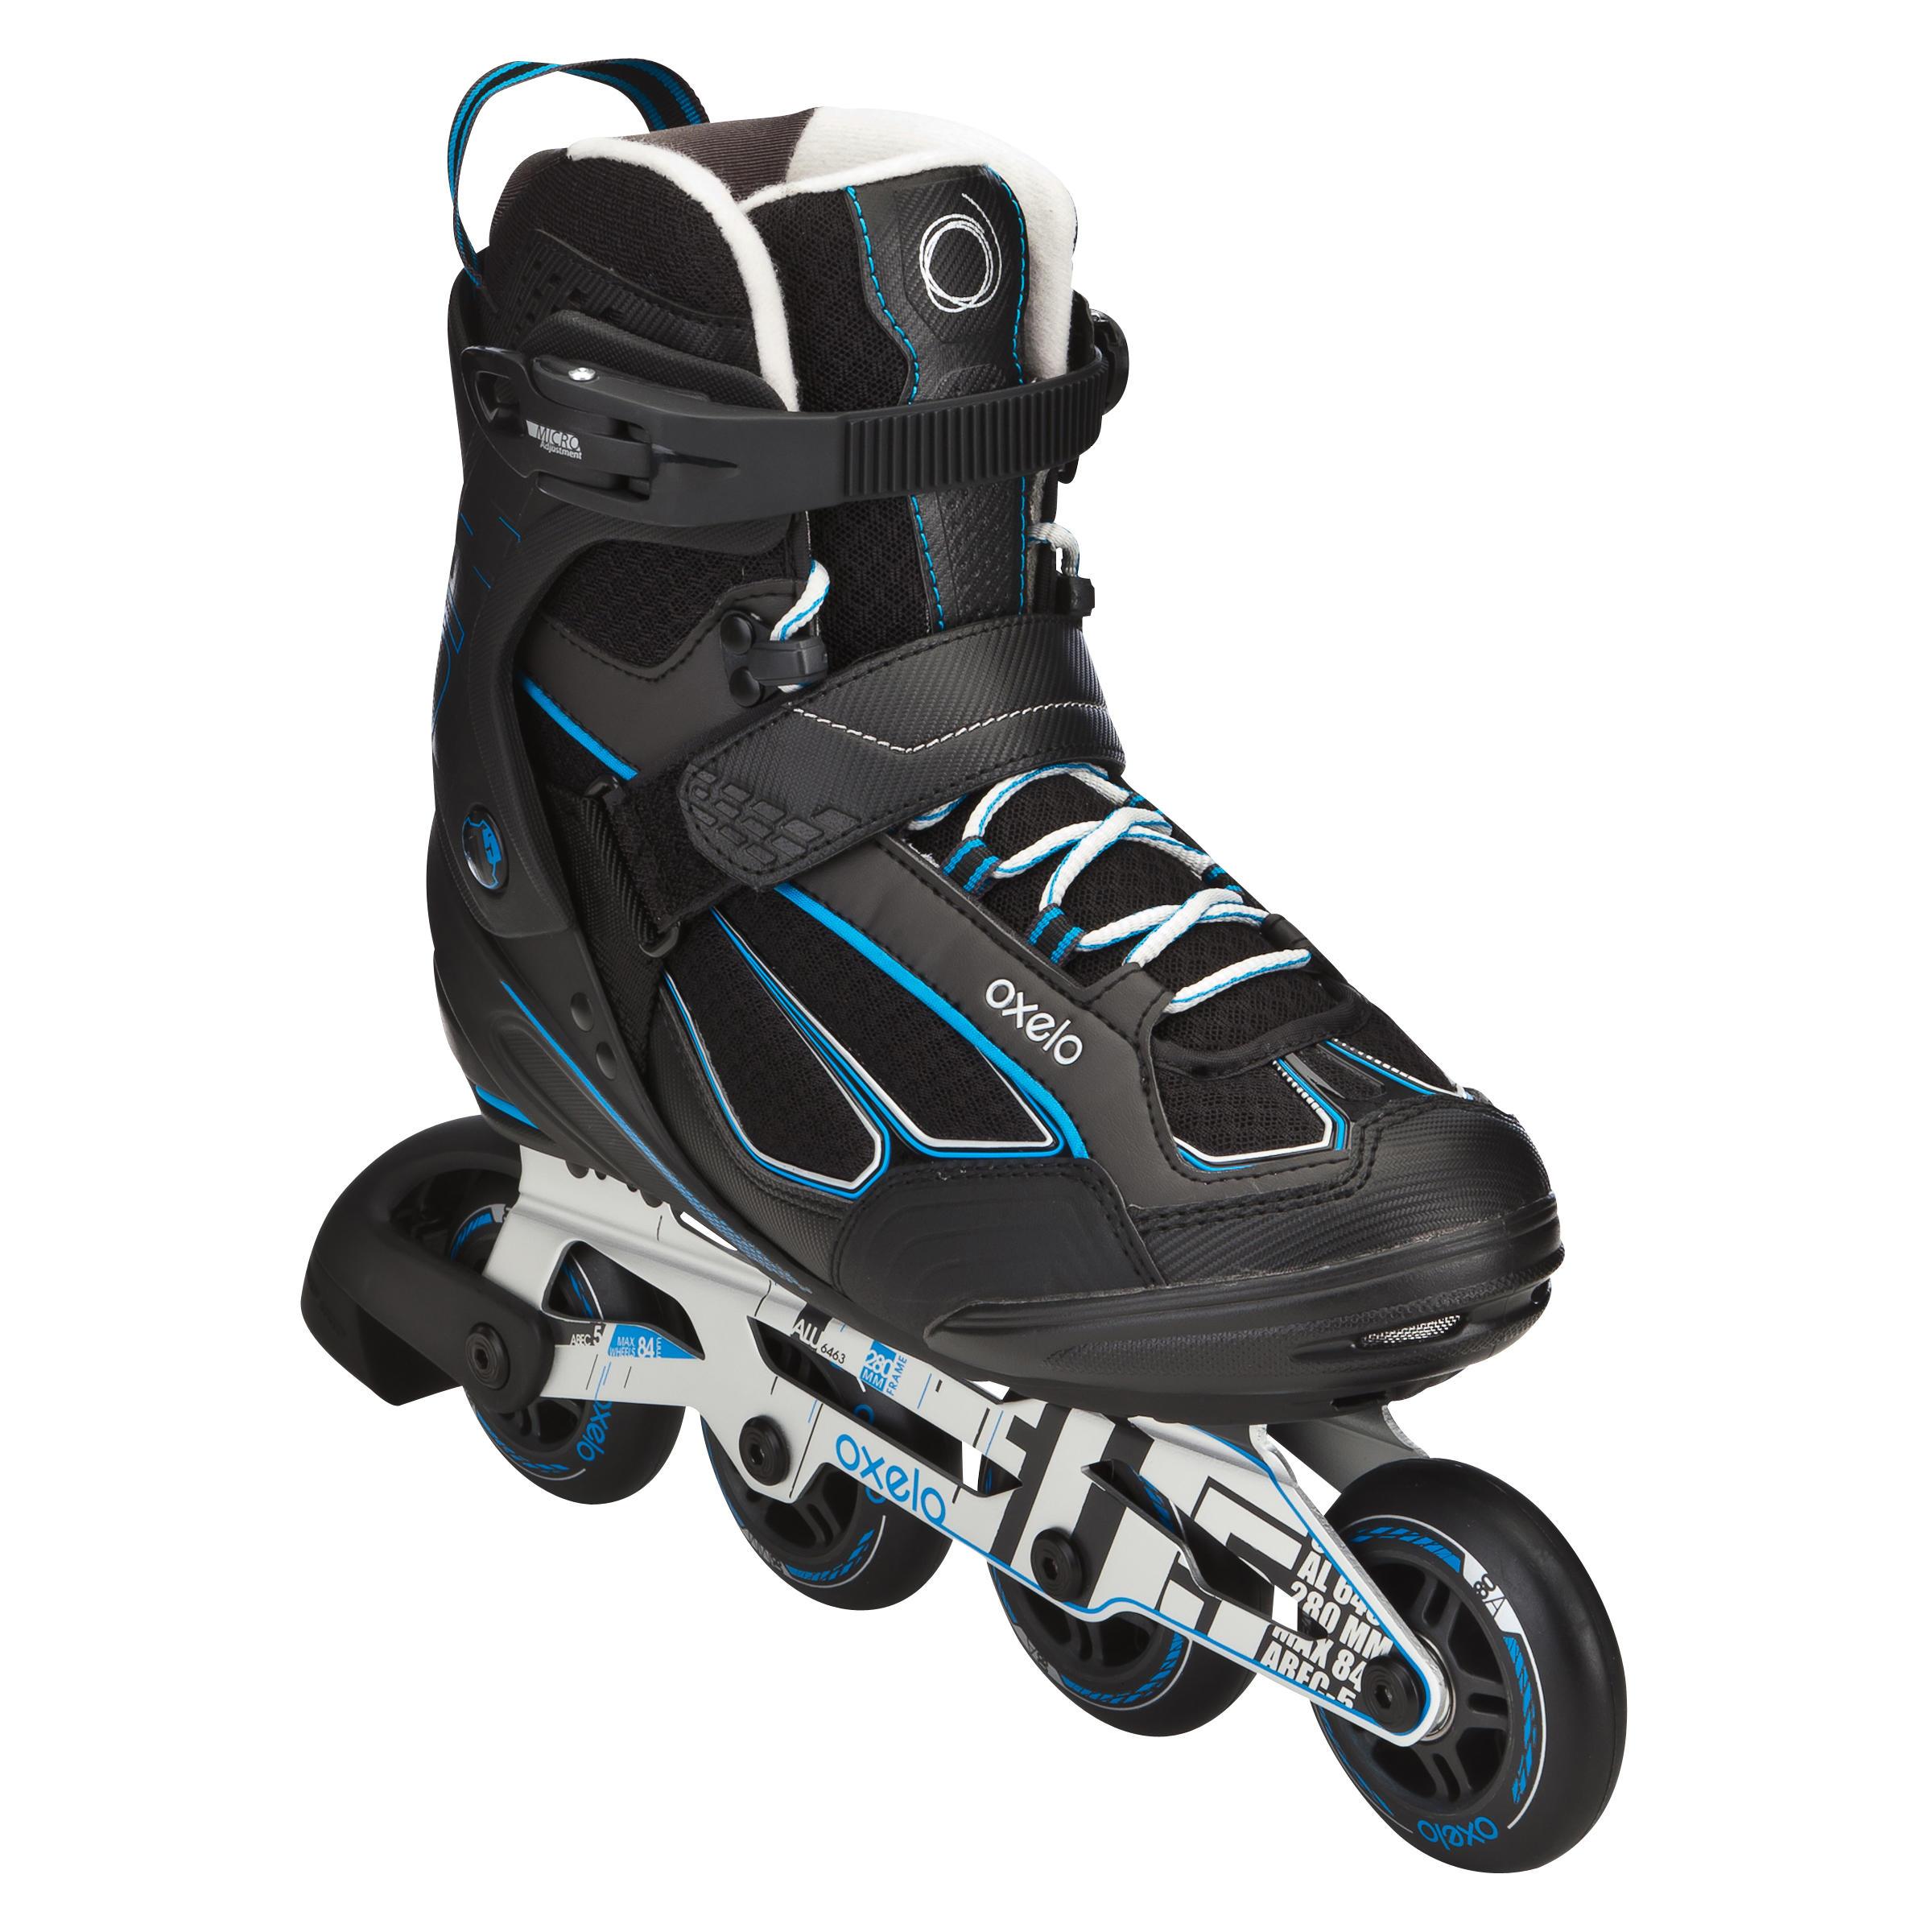 009d9bb153d Oxelo Fitness skates Fit 5 voor heren zwart/blauw thumbnail